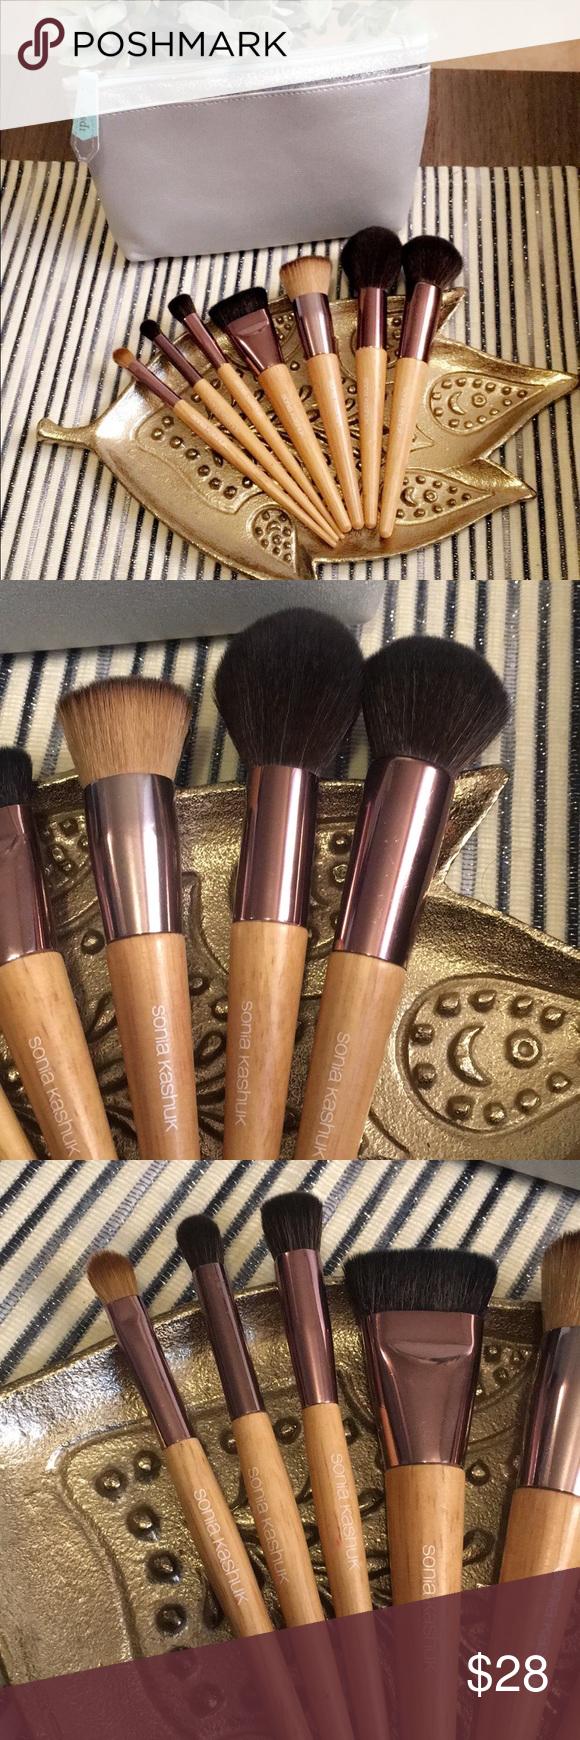 Sonia Kashuk Wooden Makeup Brushes (face + eyes) Best